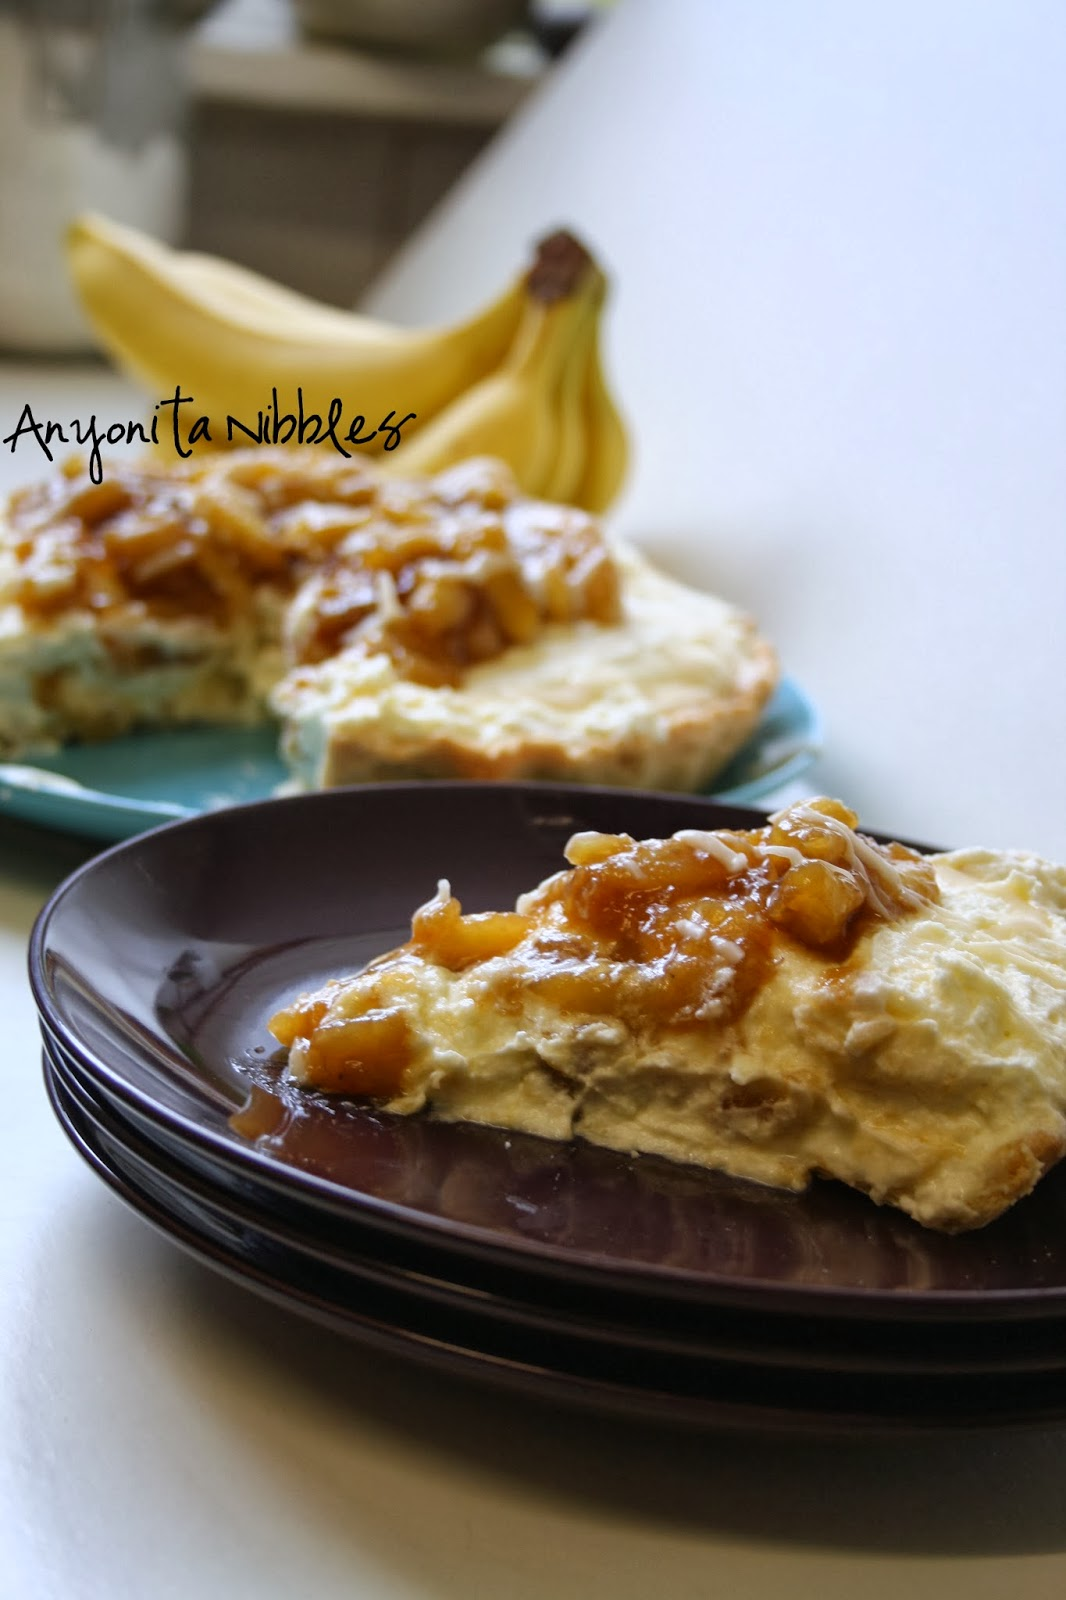 Caramelized Banana Cream Pie Recipe from www.anyonita-nibbles.co.uk